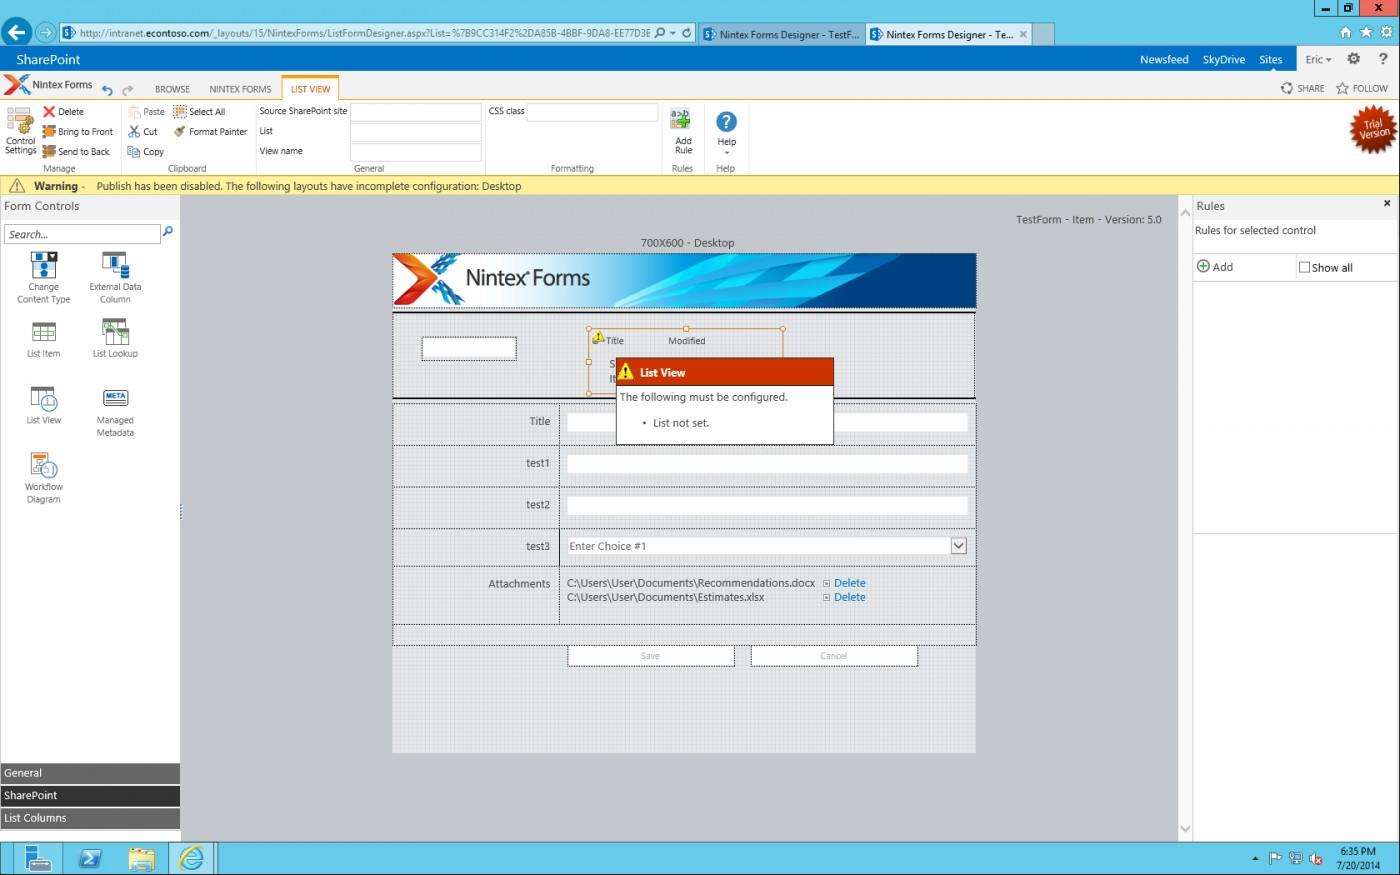 Sharepoint Nintex Forms Tutorial